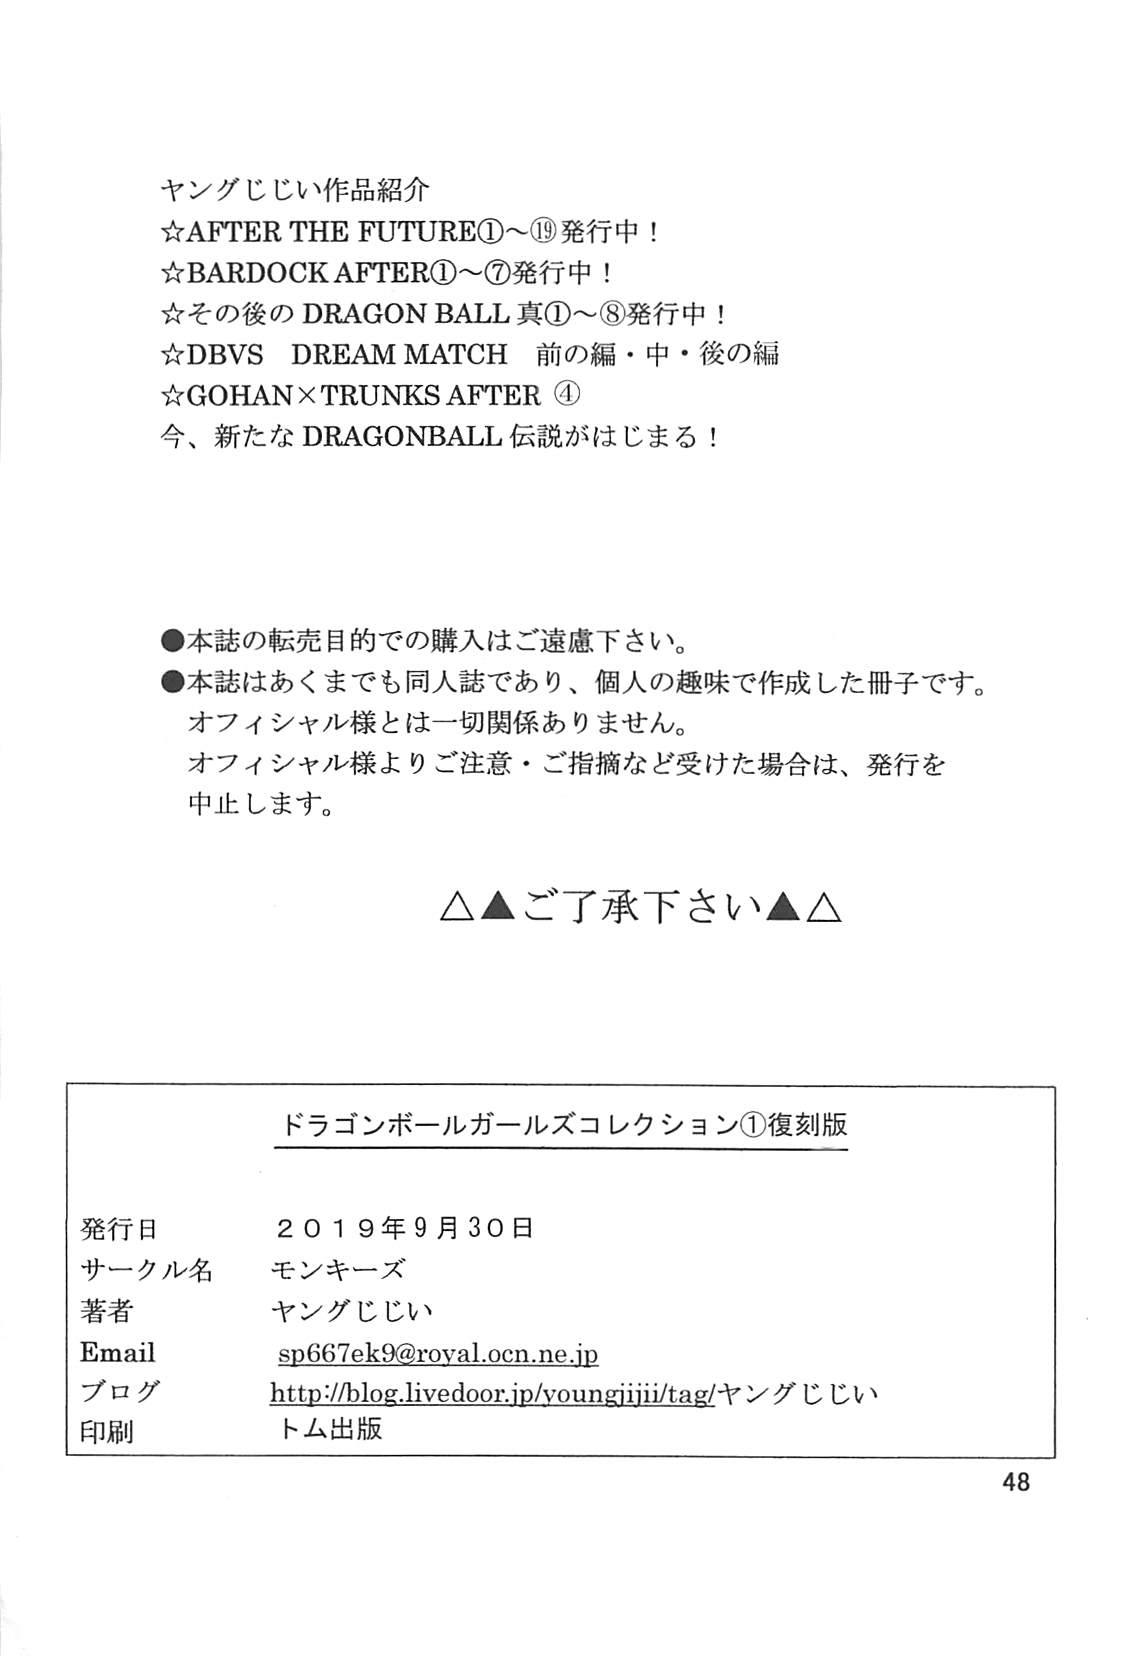 Dragon Ball Girls Collection 1 Fukkokuban 48